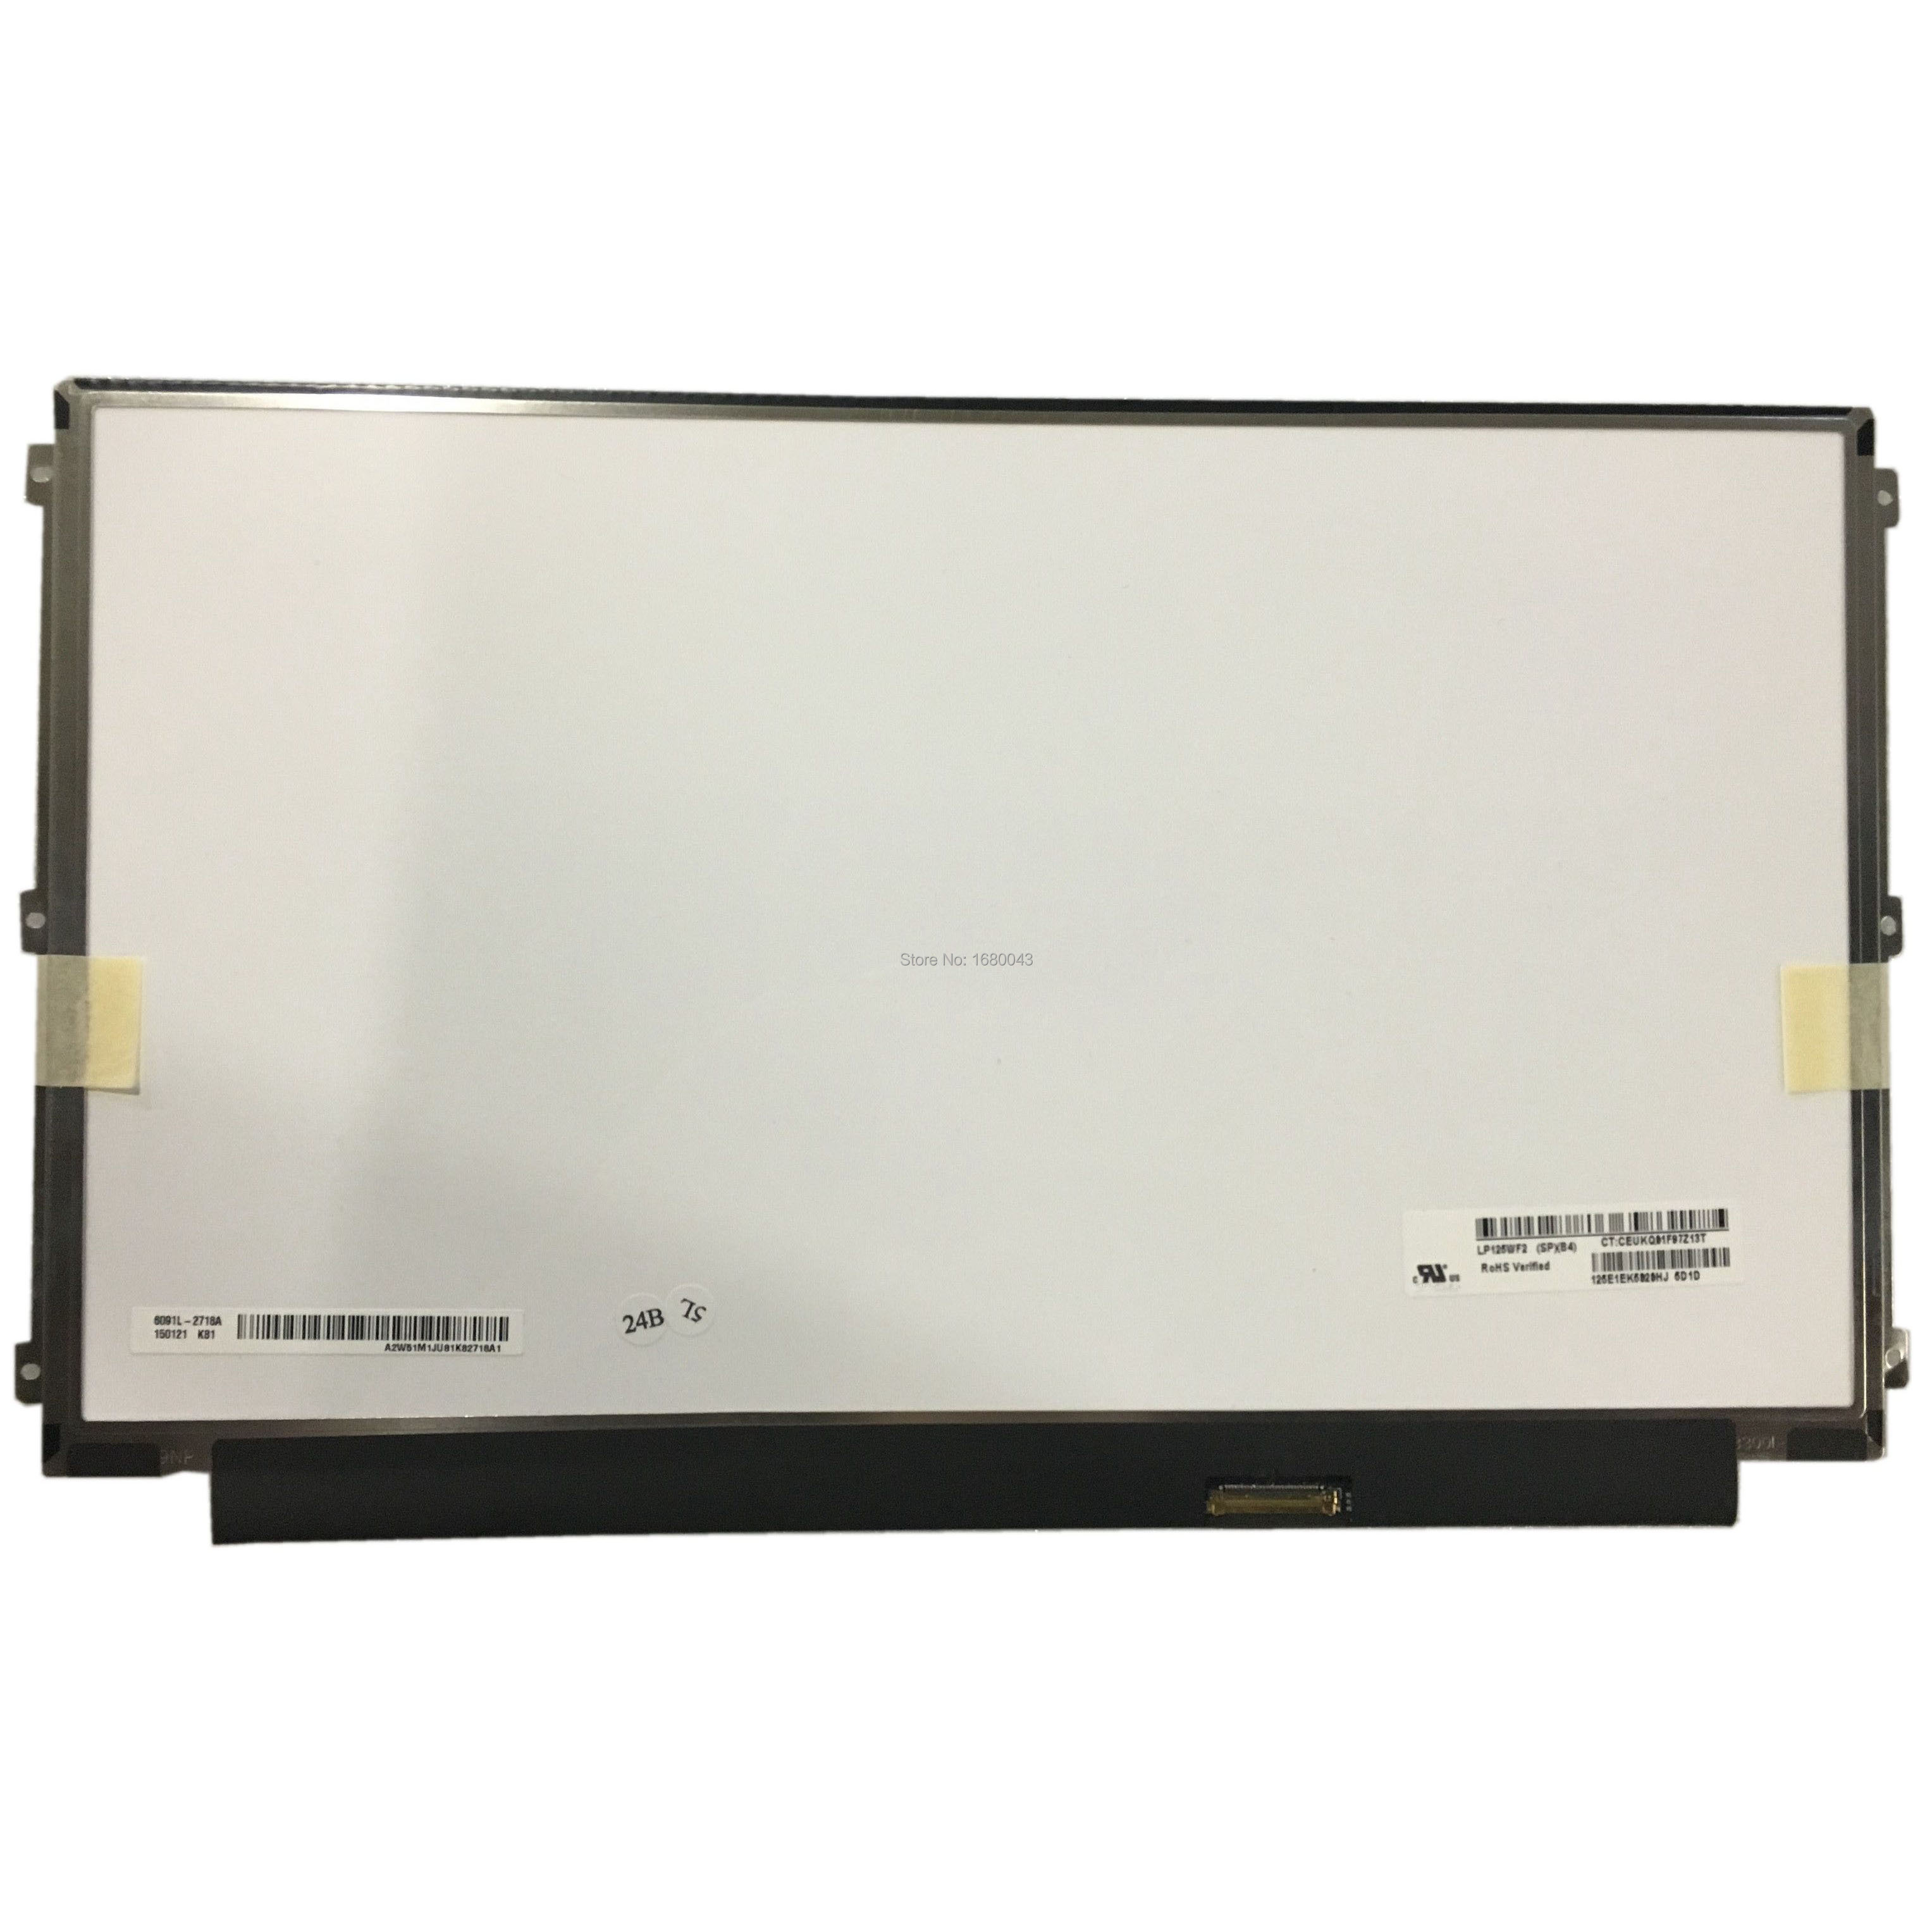 LP125WF2 SPB4 LP125WF2(SP)(B4) Exact Same Model FHD 1920X1080 30 pinLP125WF2 SPB4 LP125WF2(SP)(B4) Exact Same Model FHD 1920X1080 30 pin